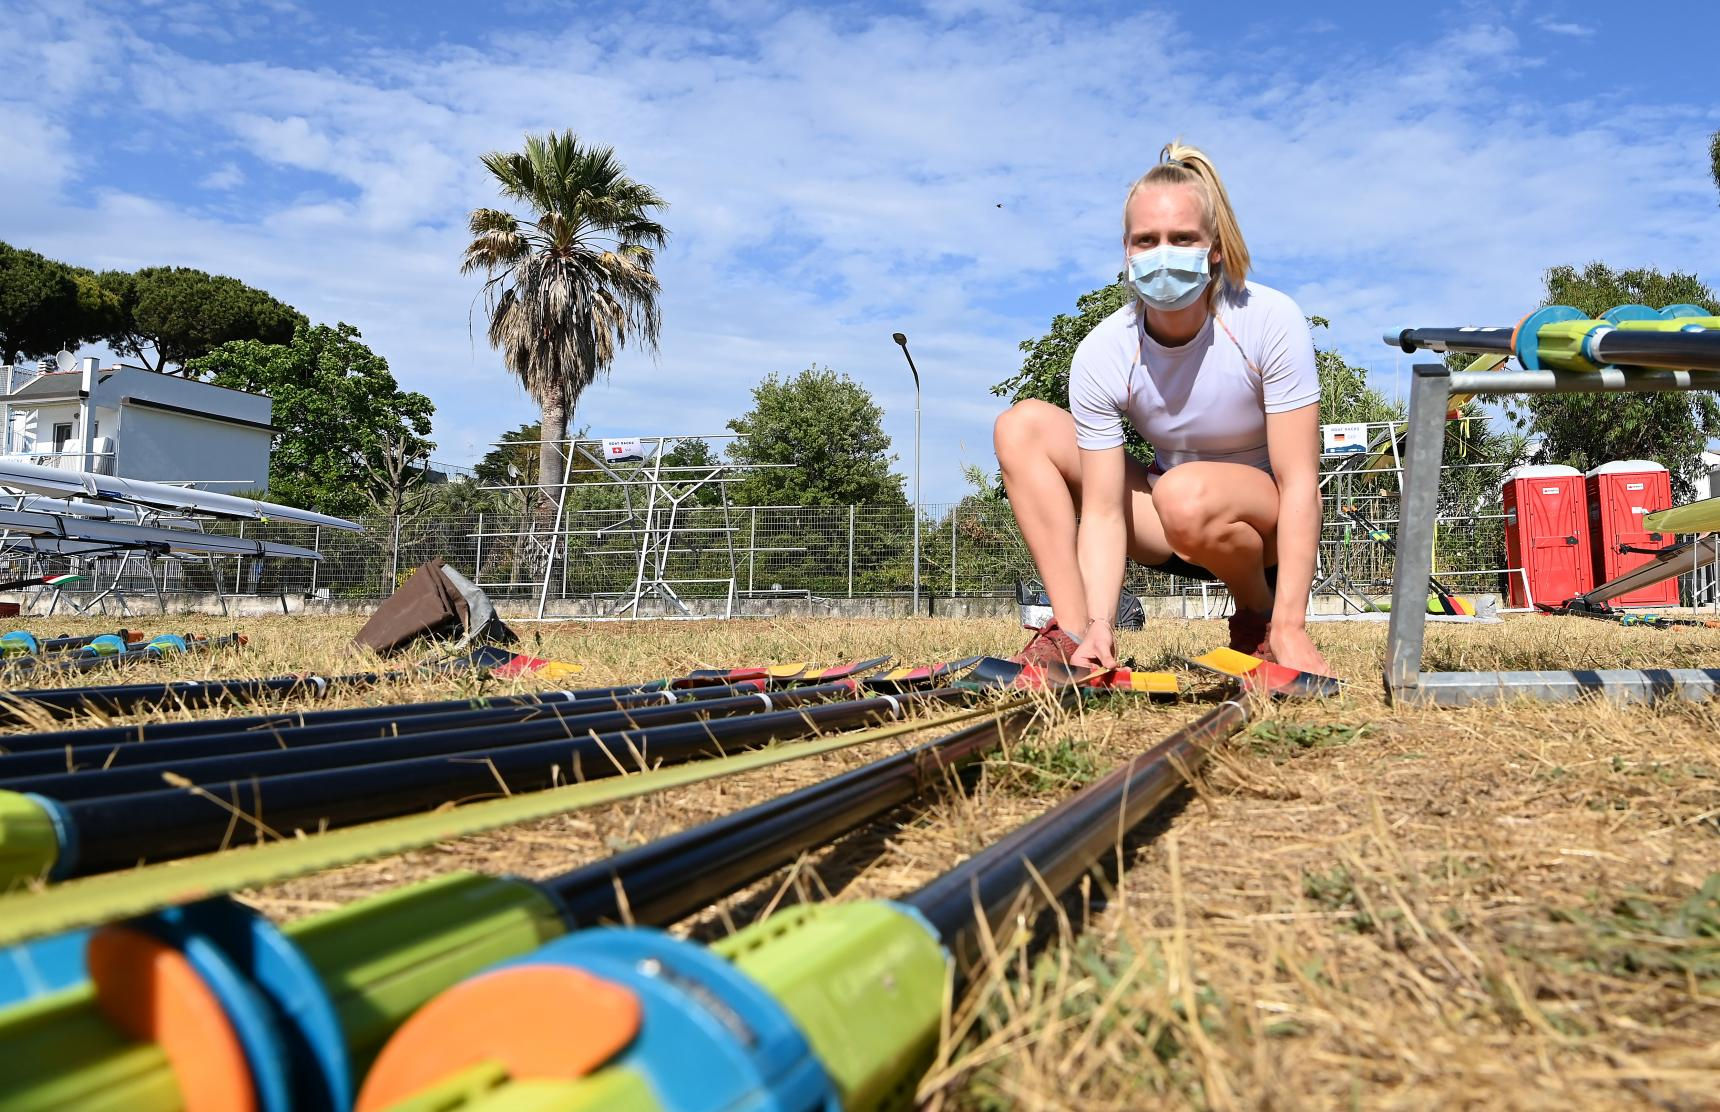 Frieda Hämmerling beim Weltcup III in Sabaudia (Italien) vom 4. bis 6. Juni 2021